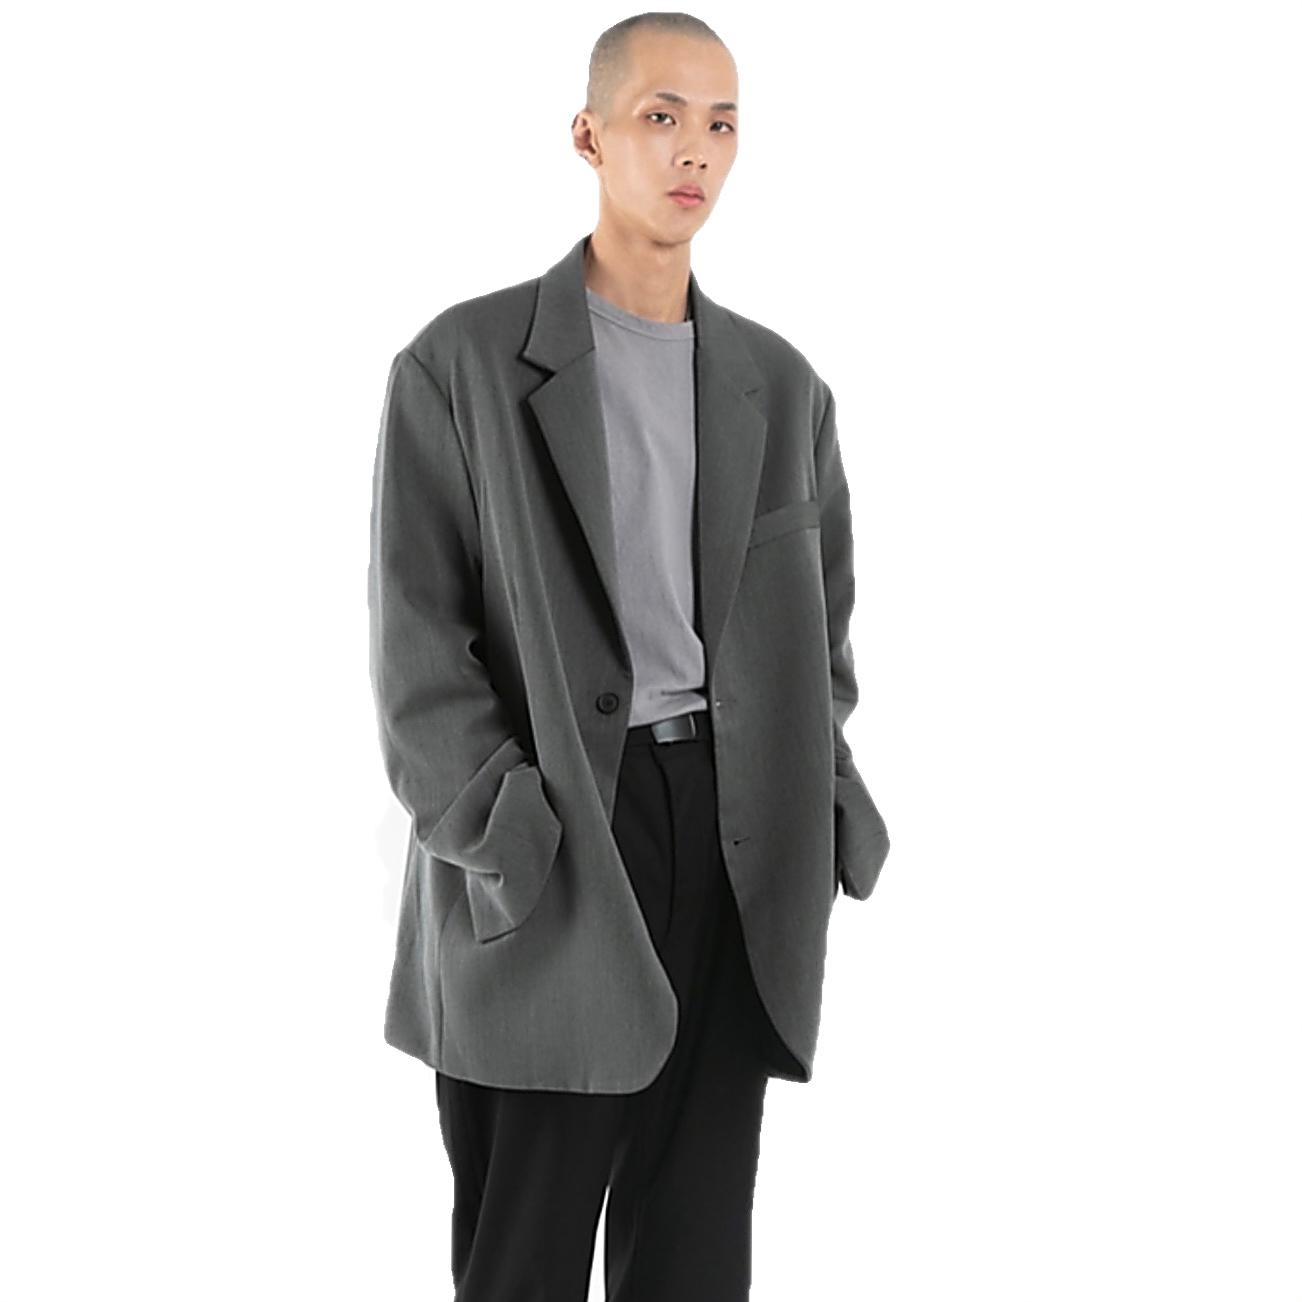 【113 Market】自制韩国Raucohouse百搭街头纯色西装外套